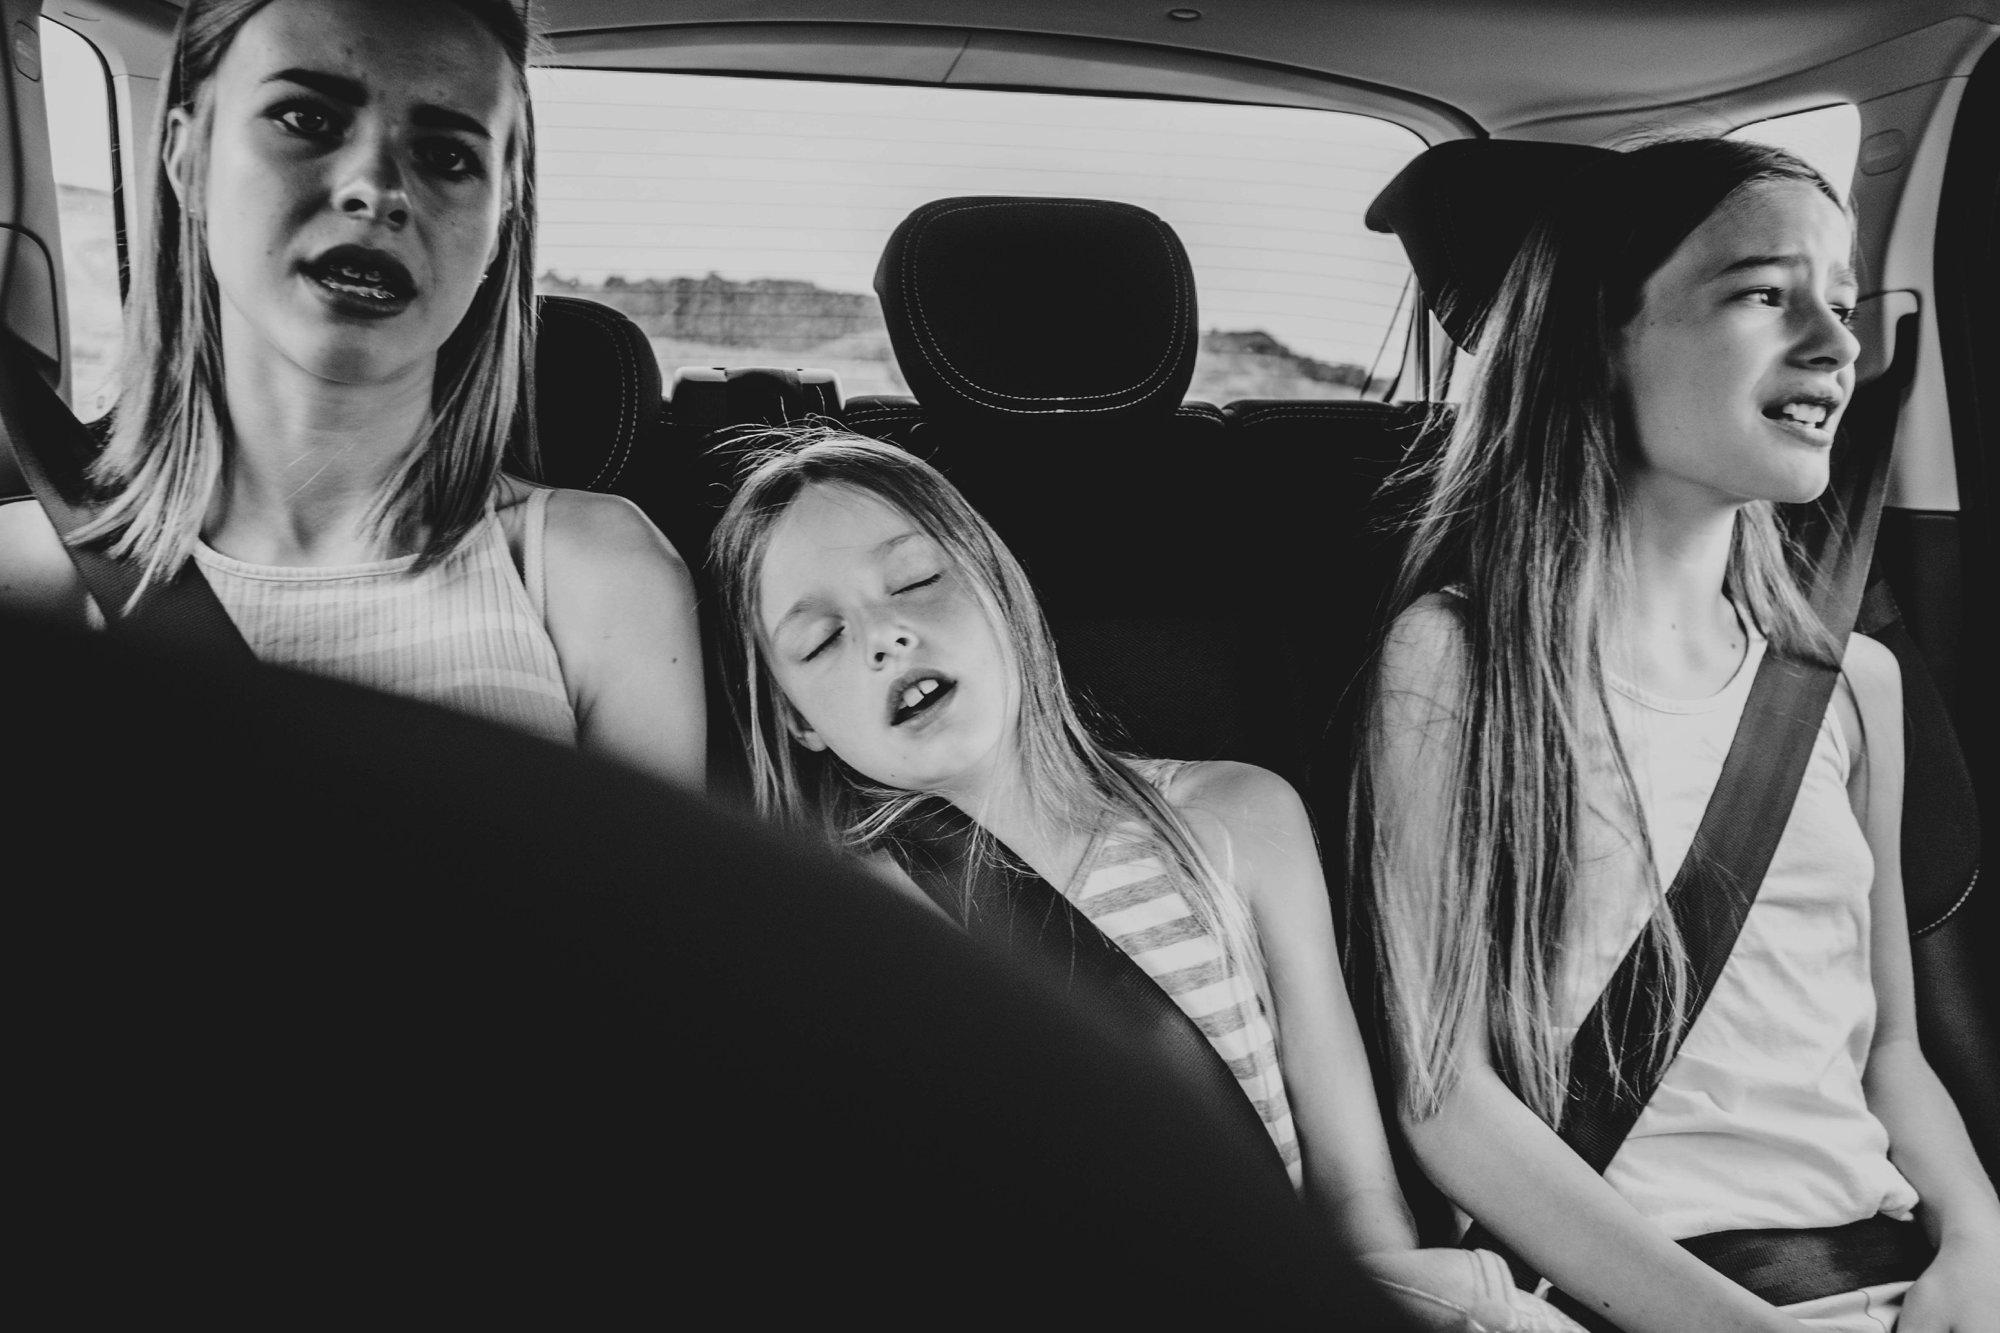 Little girl asleep in back of car Essex Documentary Wedding Travel Family Photographer